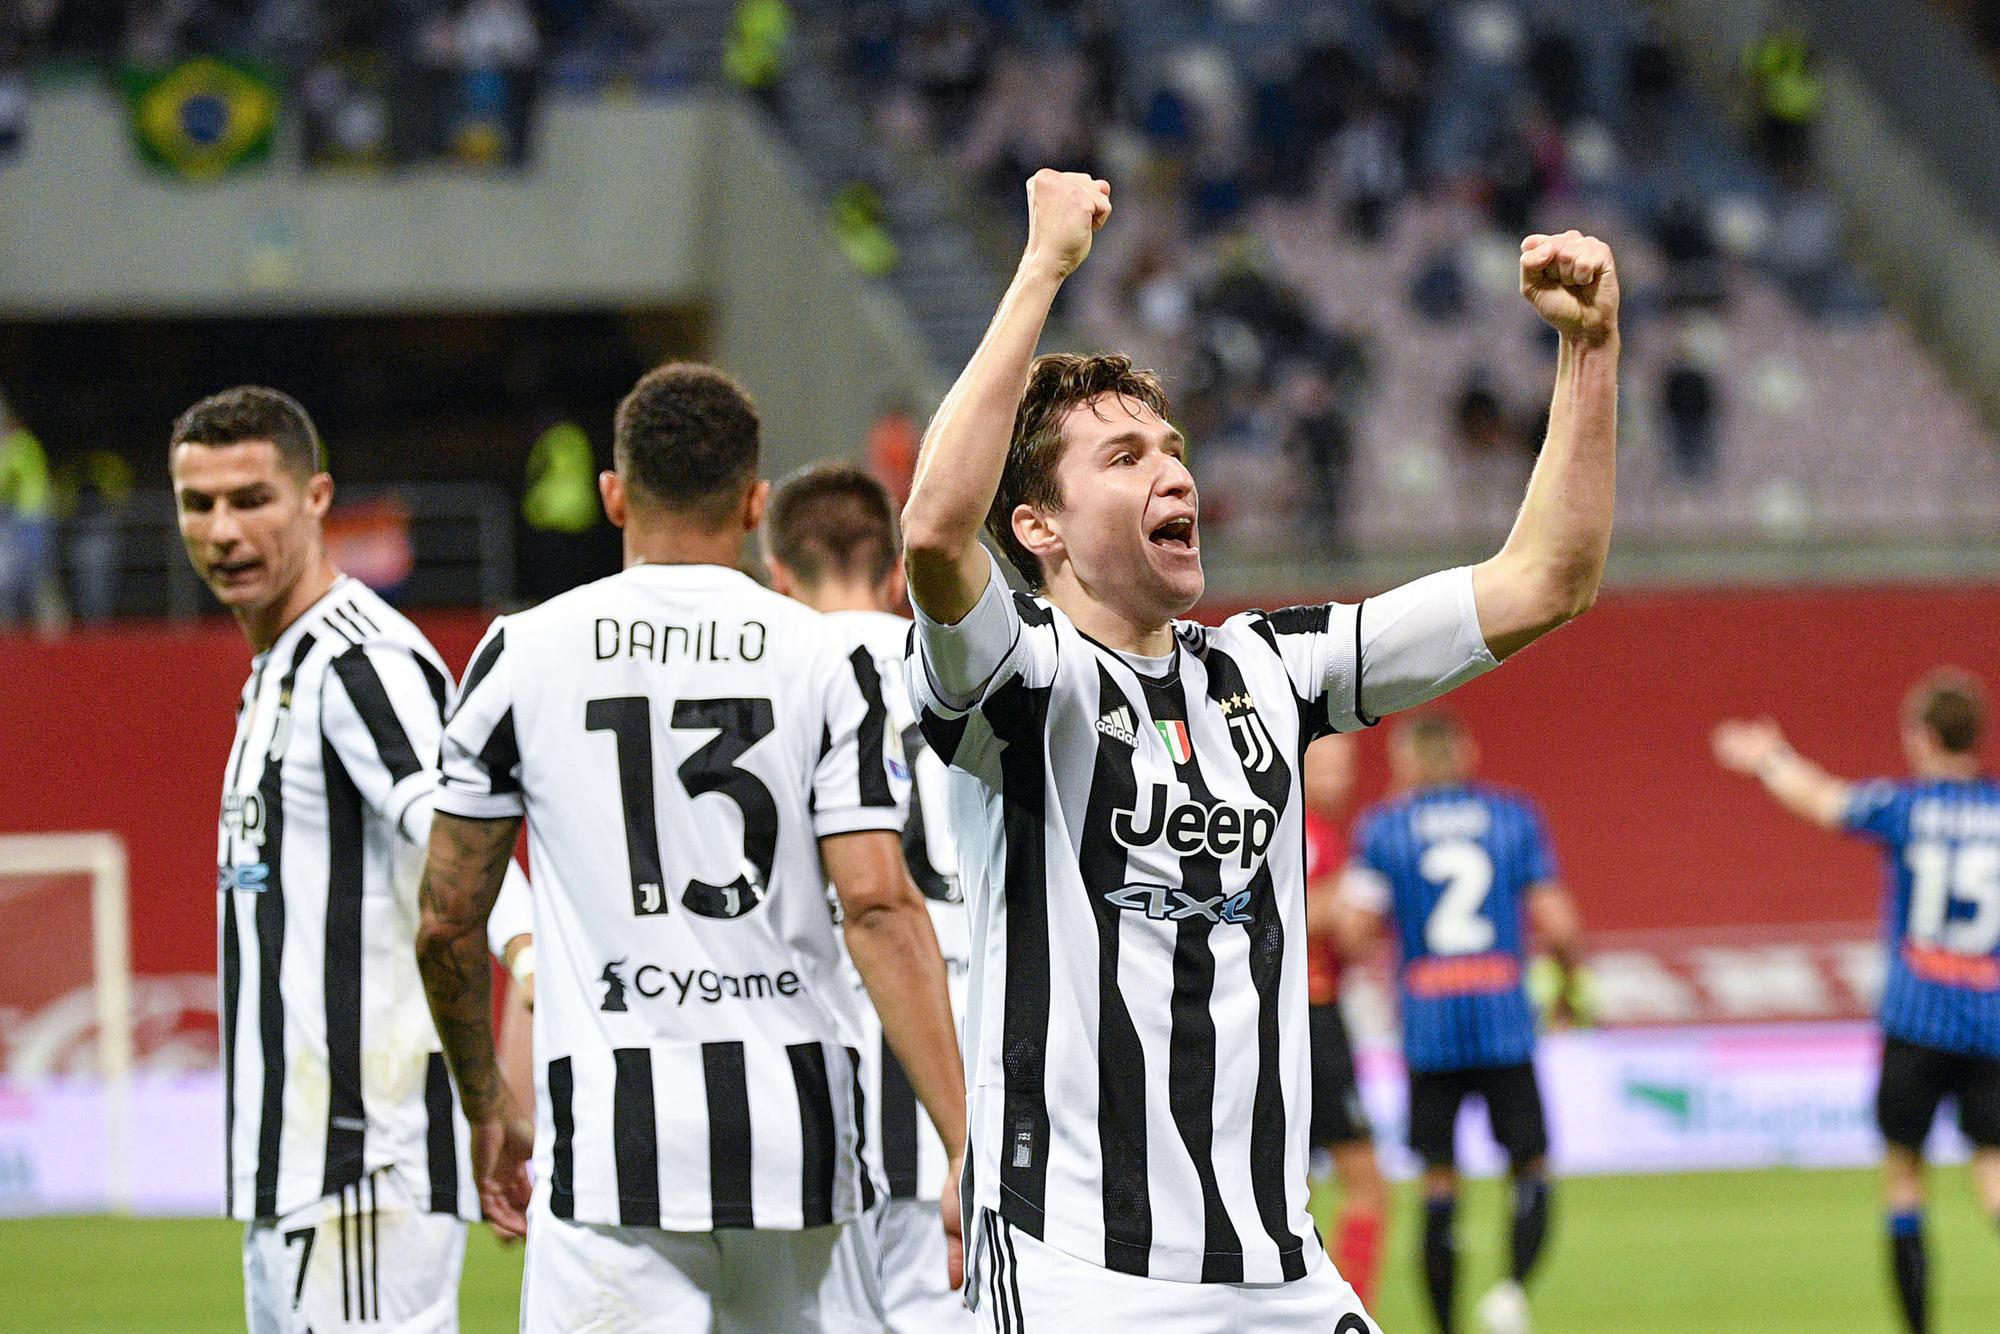 Chiesa adalah pemain terbaik dalam serangan Juventus melawan Atalanta.  Foto: Lapresse